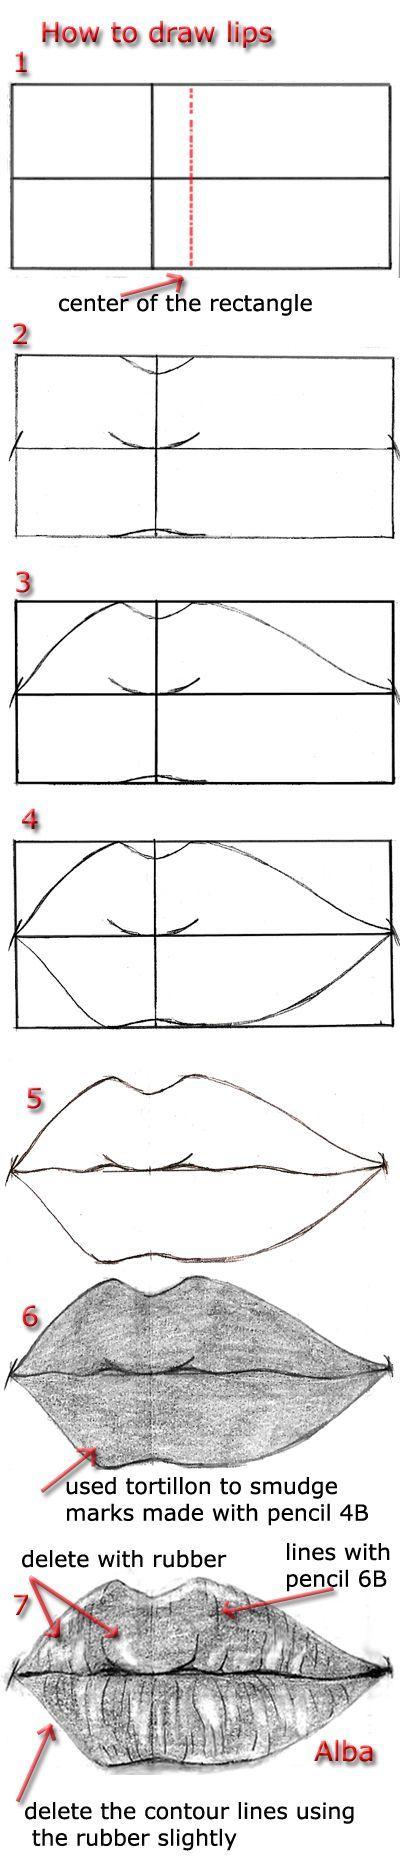 Tutorial draw lips 3 by ~lamorghana on deviantART